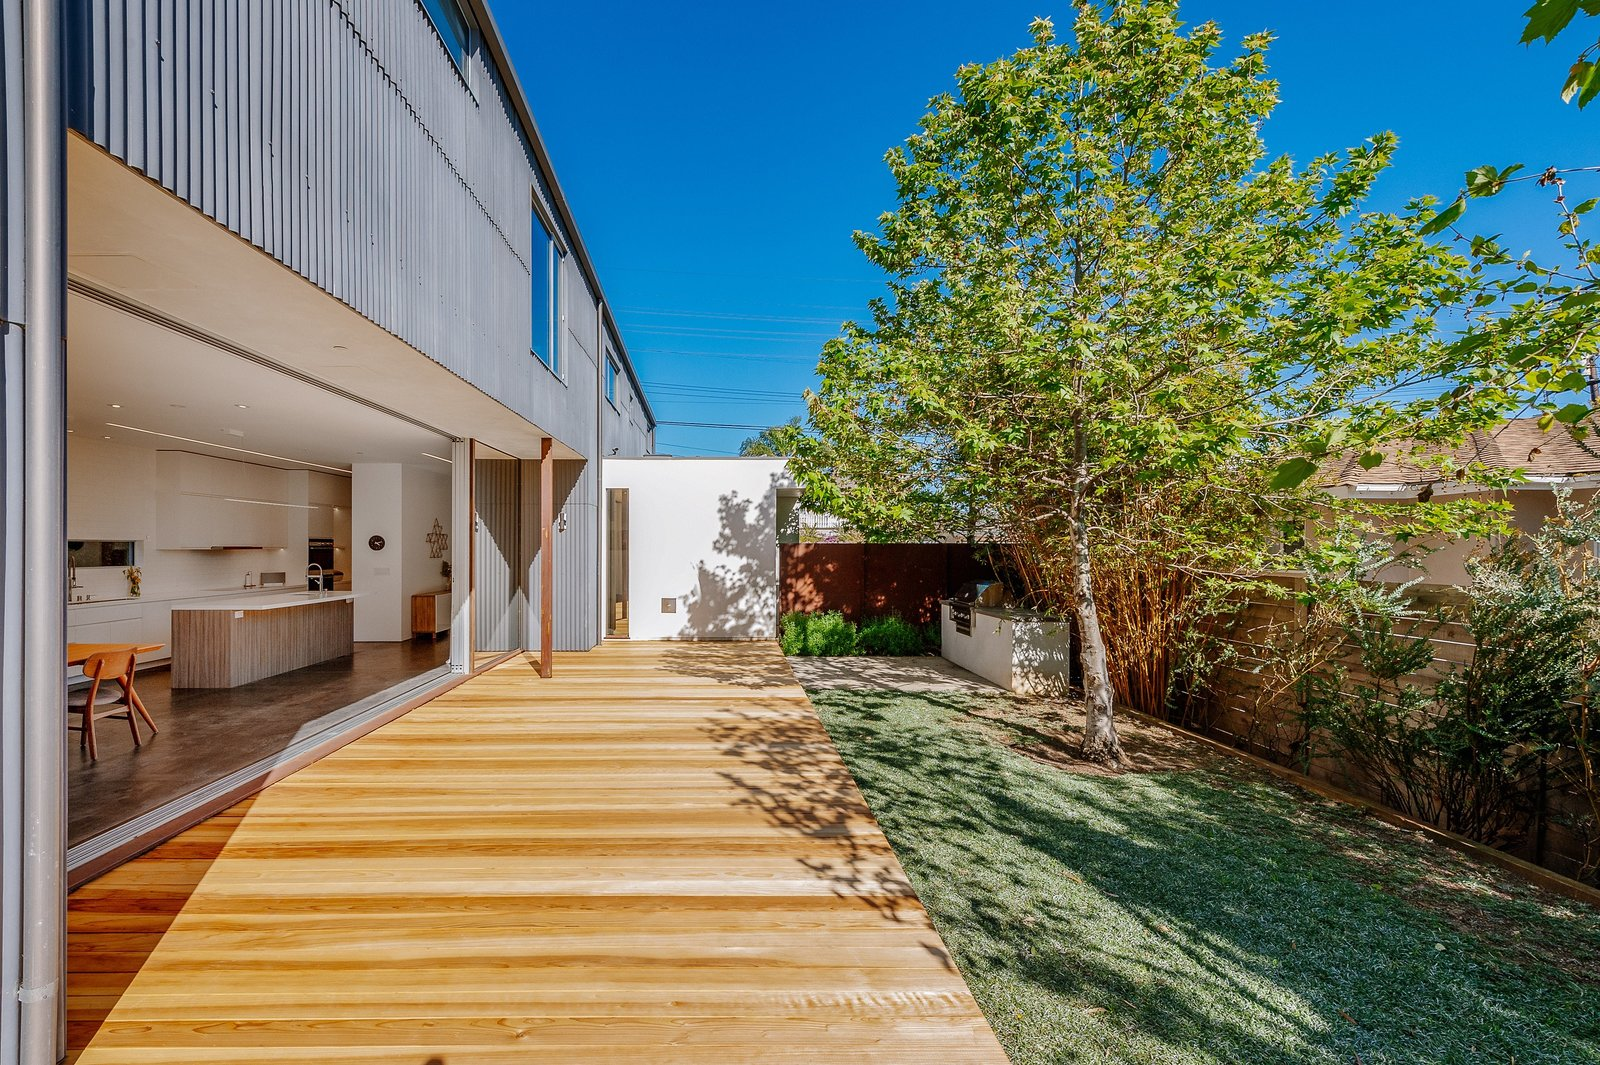 Monokuro House backyard